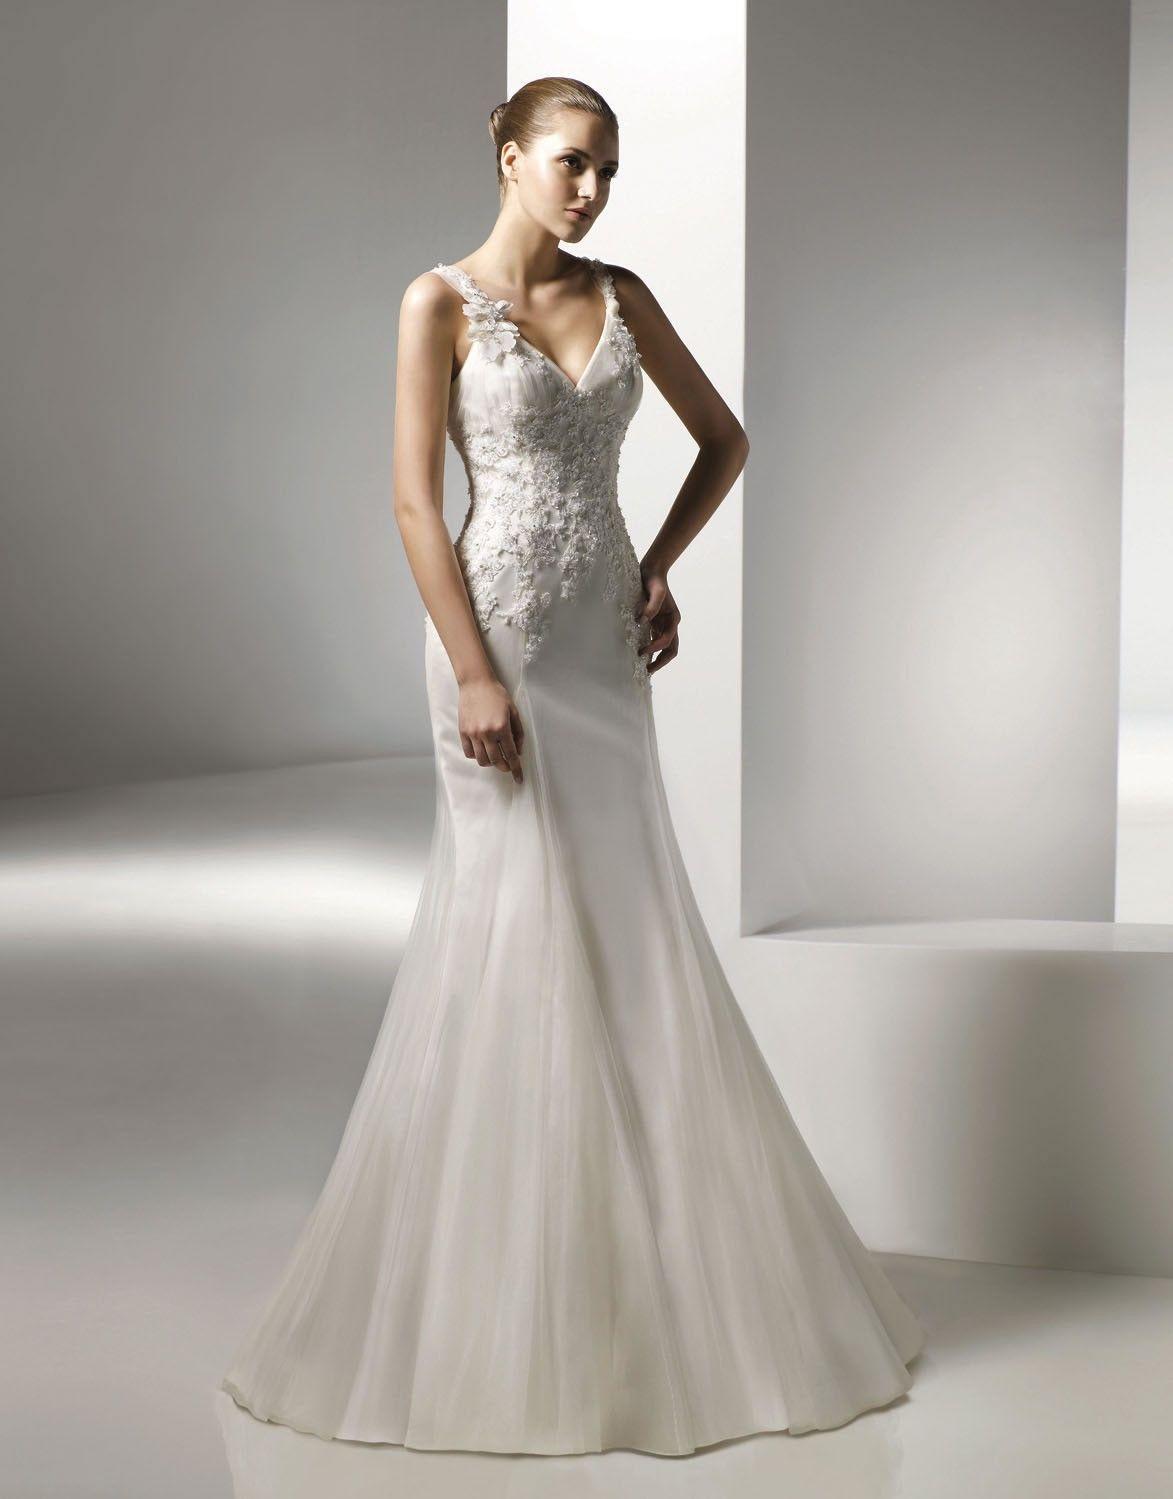 Wedding Dress Maker Chicago: Sell wedding dress chicago area uk ...